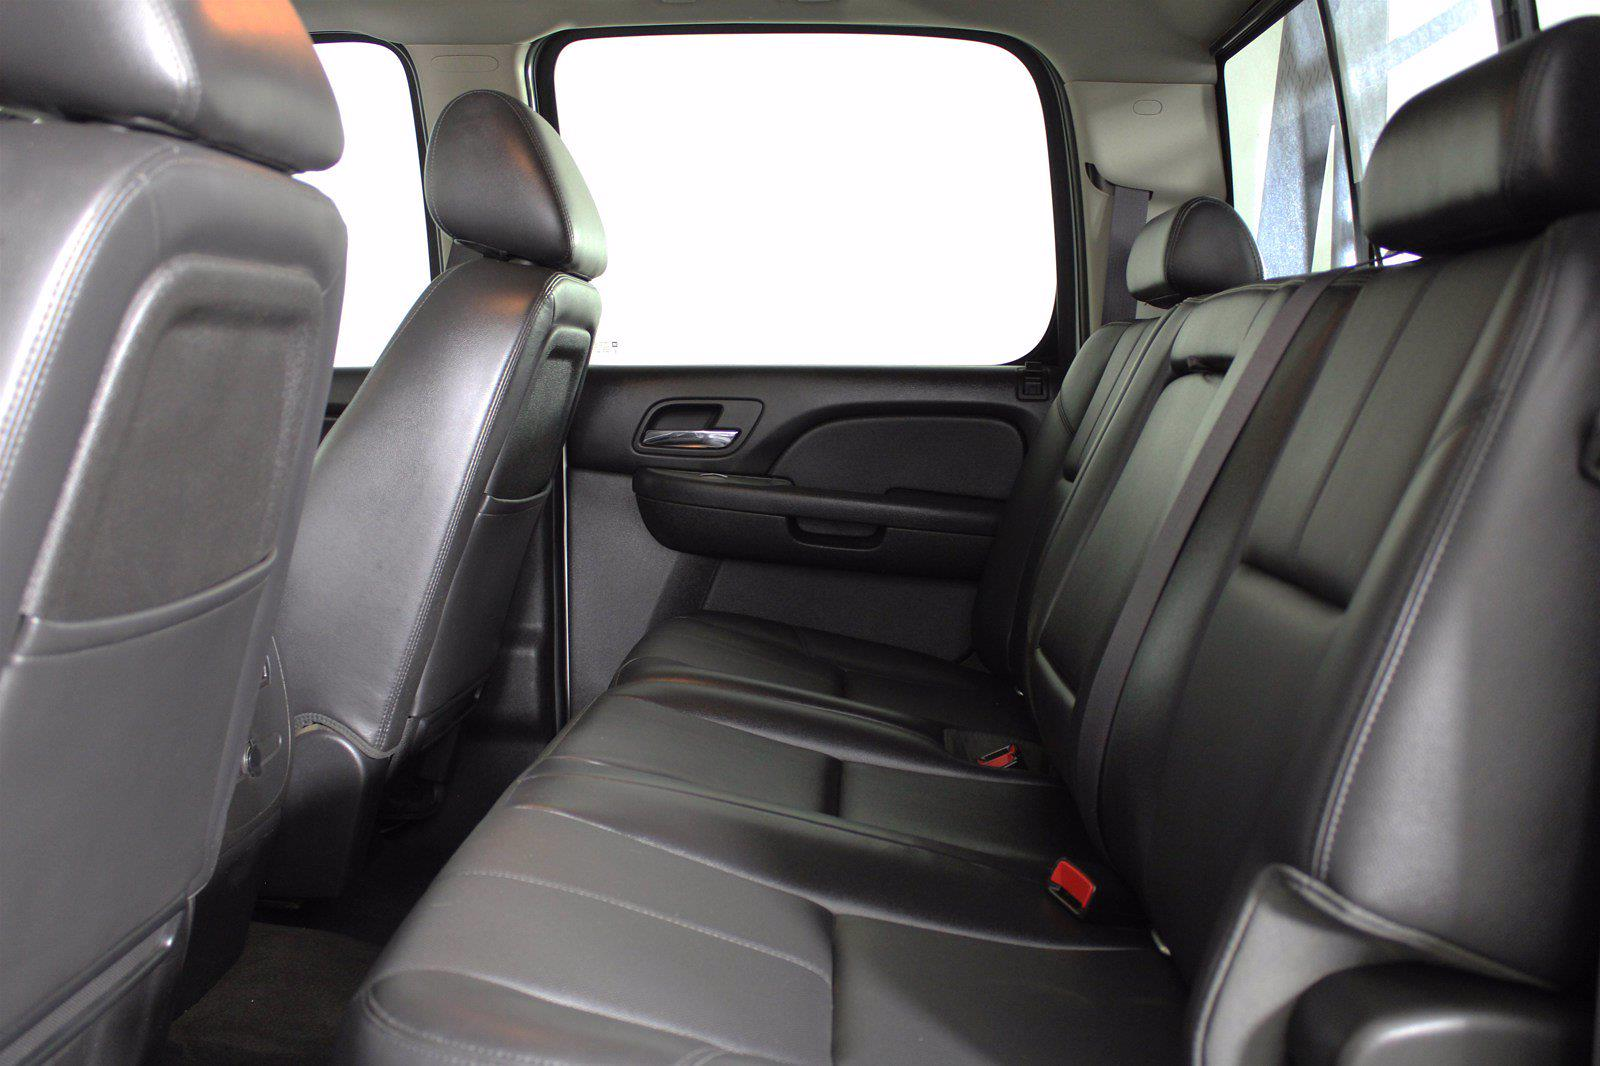 2014 Chevrolet Silverado 3500 Crew Cab 4x4, Pickup #D110865A - photo 6